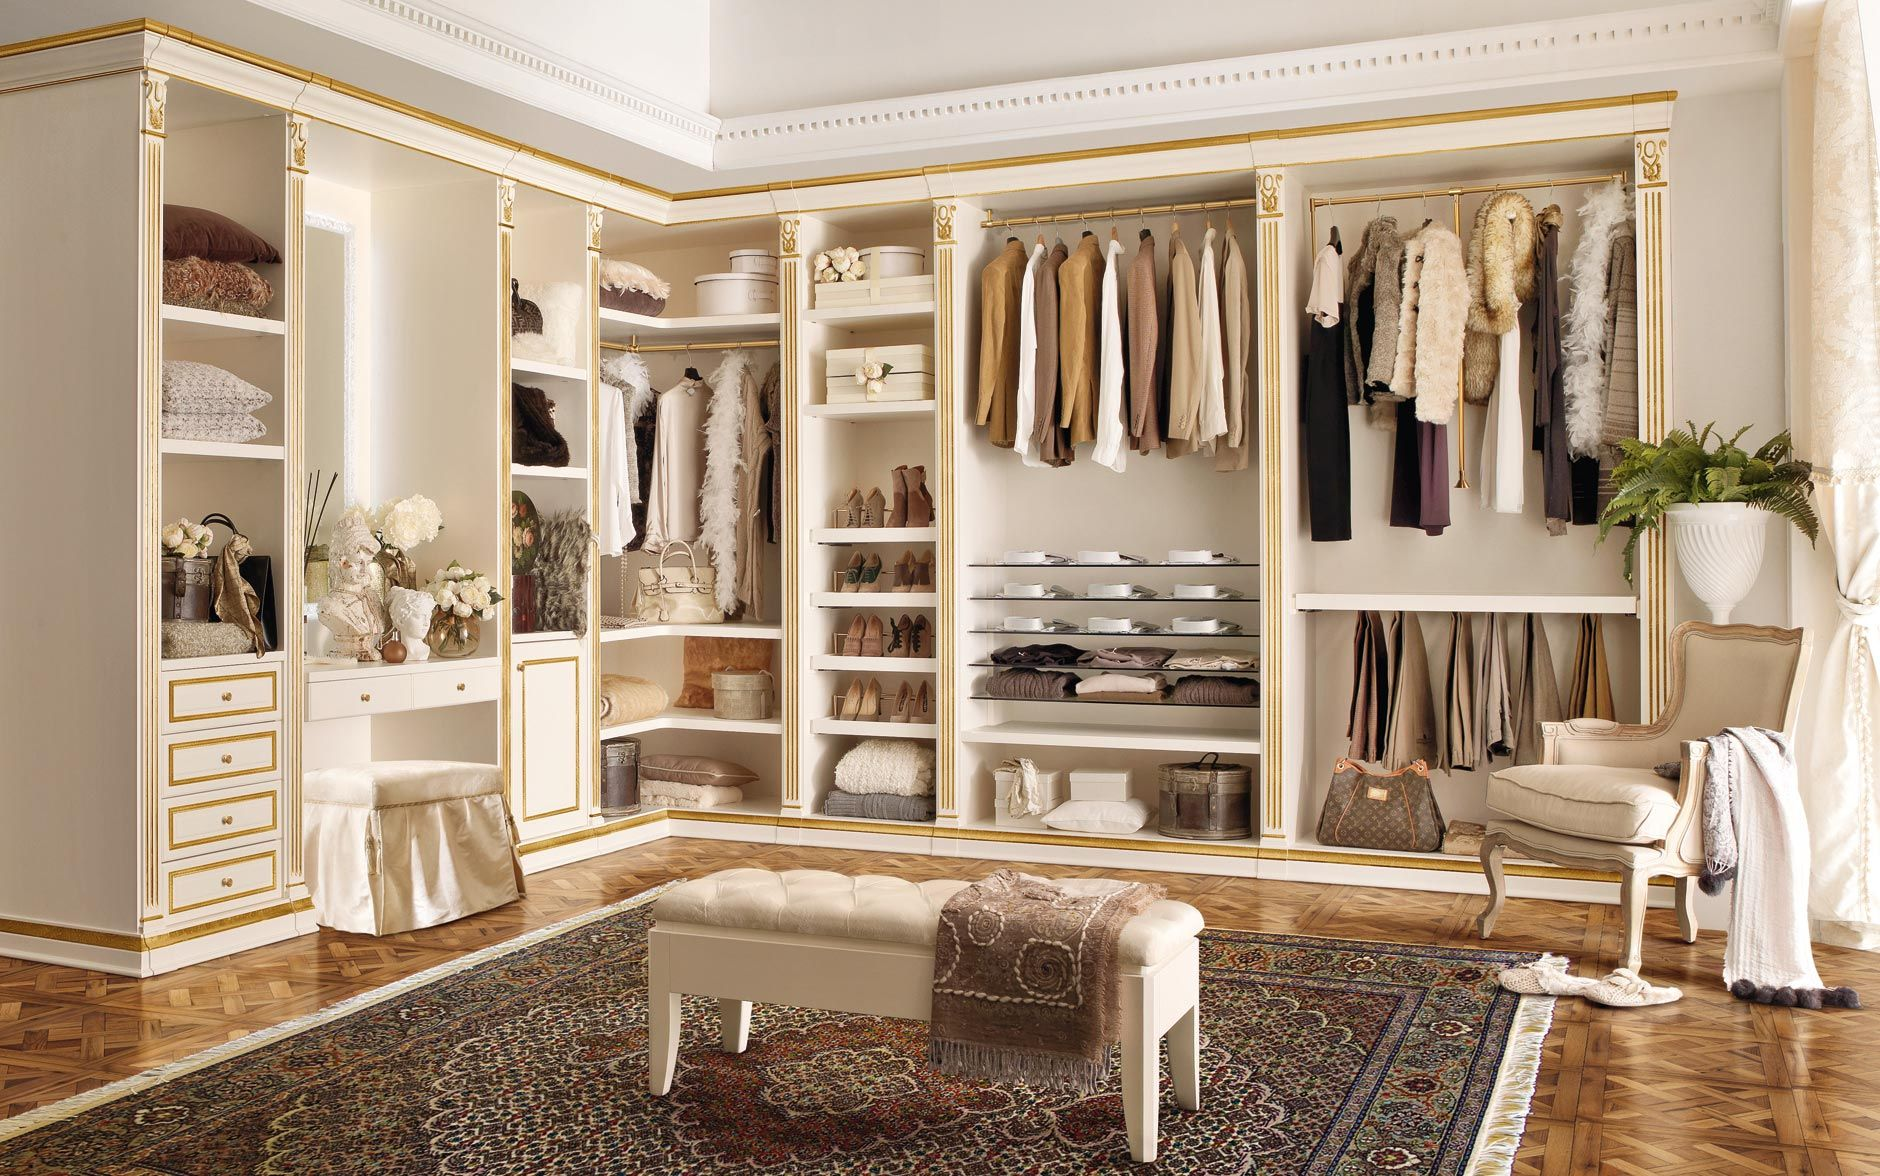 Cabina Armadio O Quarter : Cabina armadio benedetti mobili h&h dubai casa pinterest